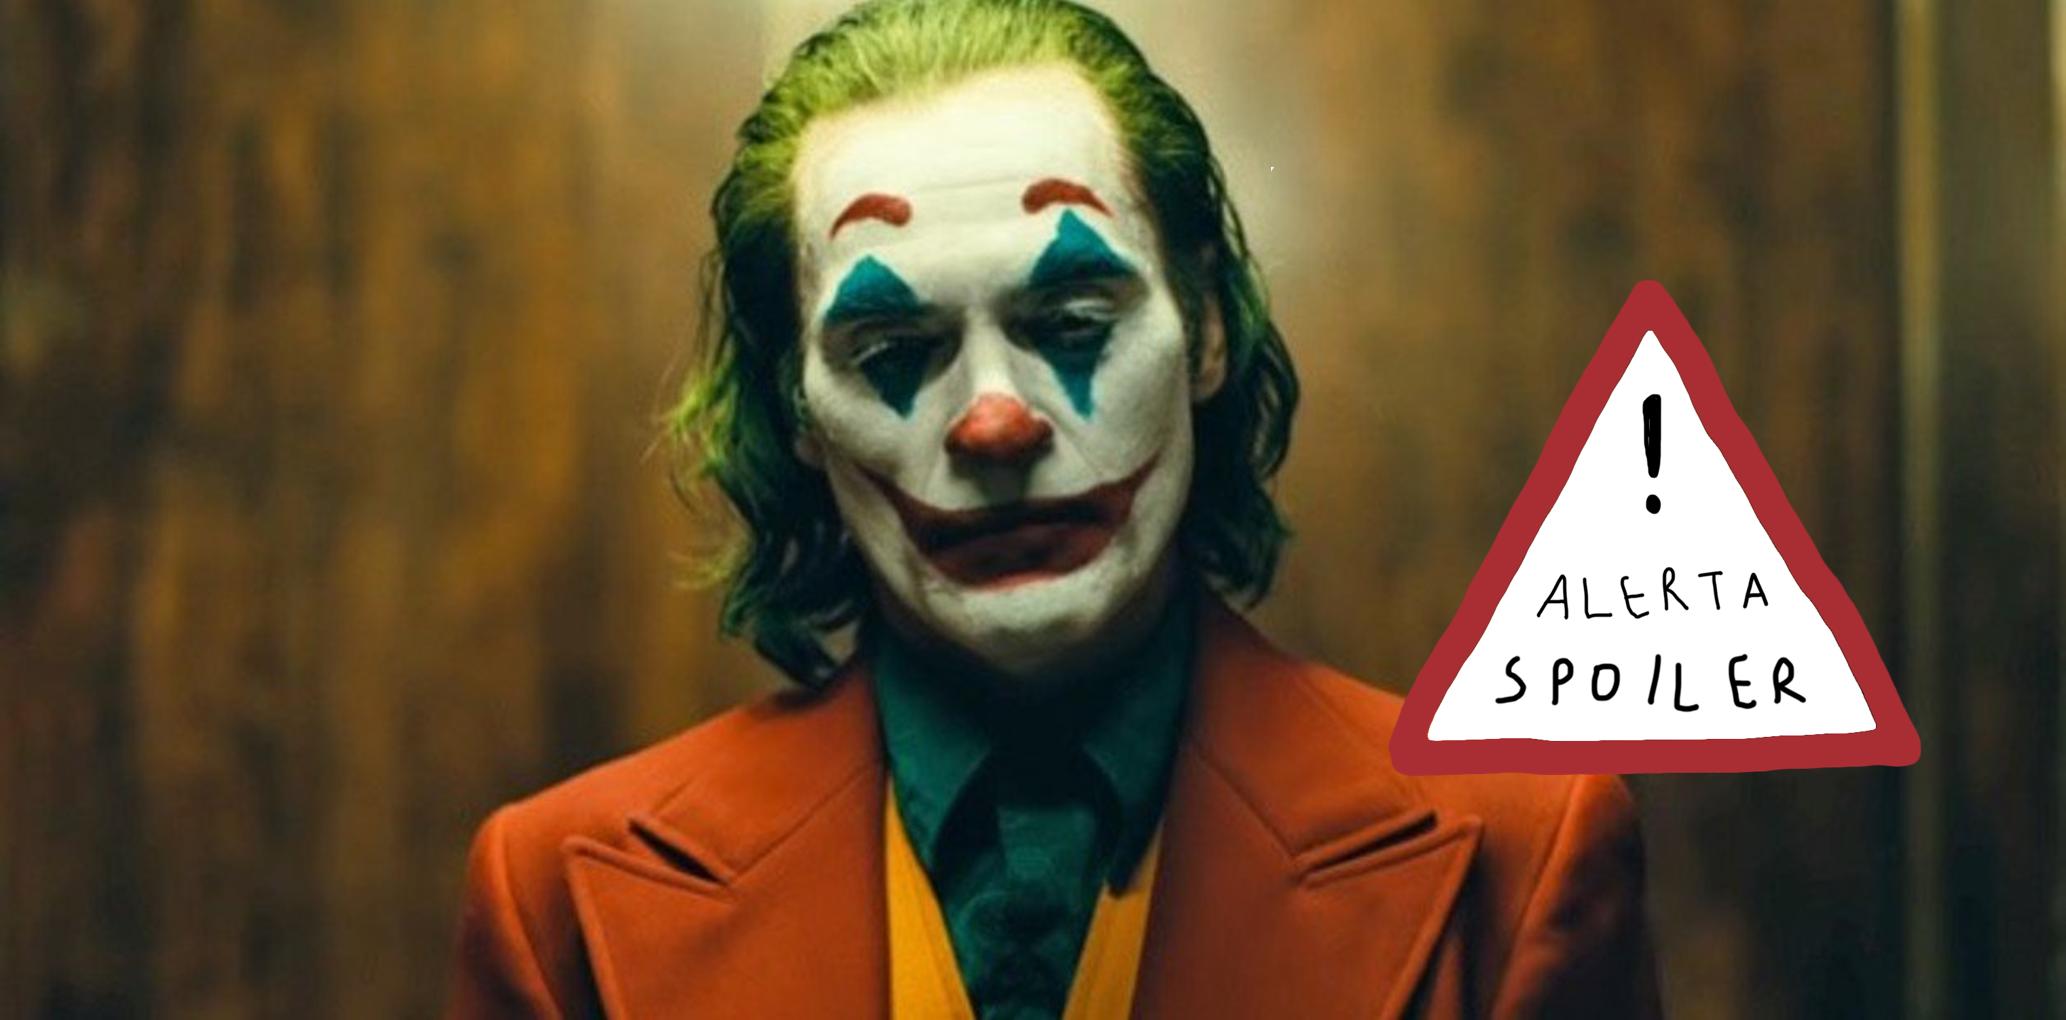 Reflexión psicológica sobre la película de Joker